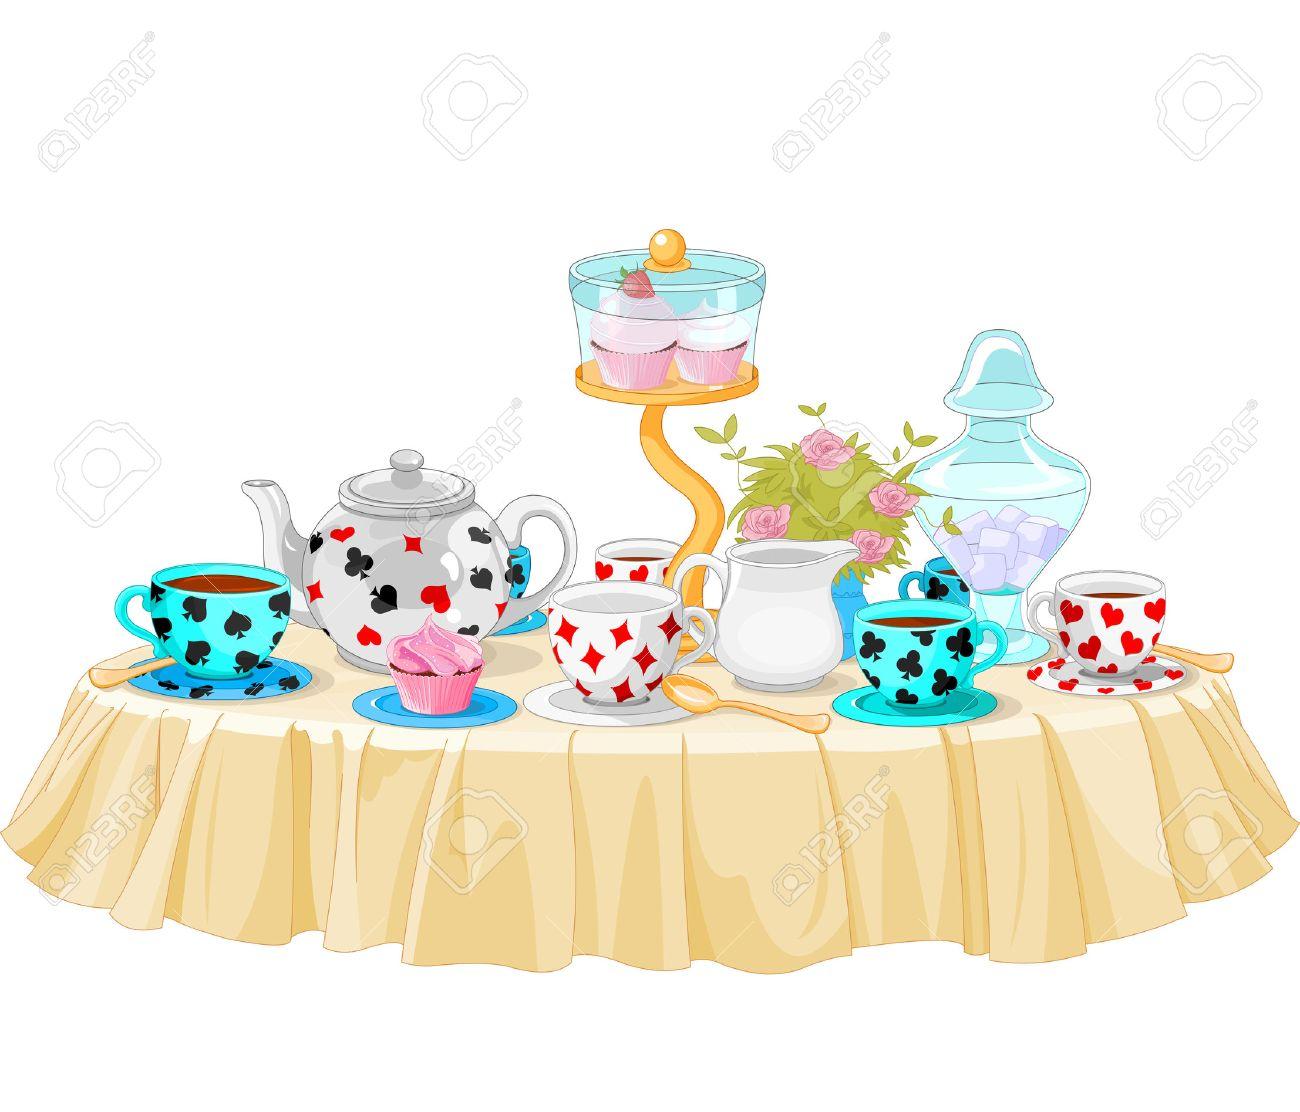 wonderland tea party decorated table royalty free cliparts vectors rh 123rf com tea party clipart images tea party clip art free downloads